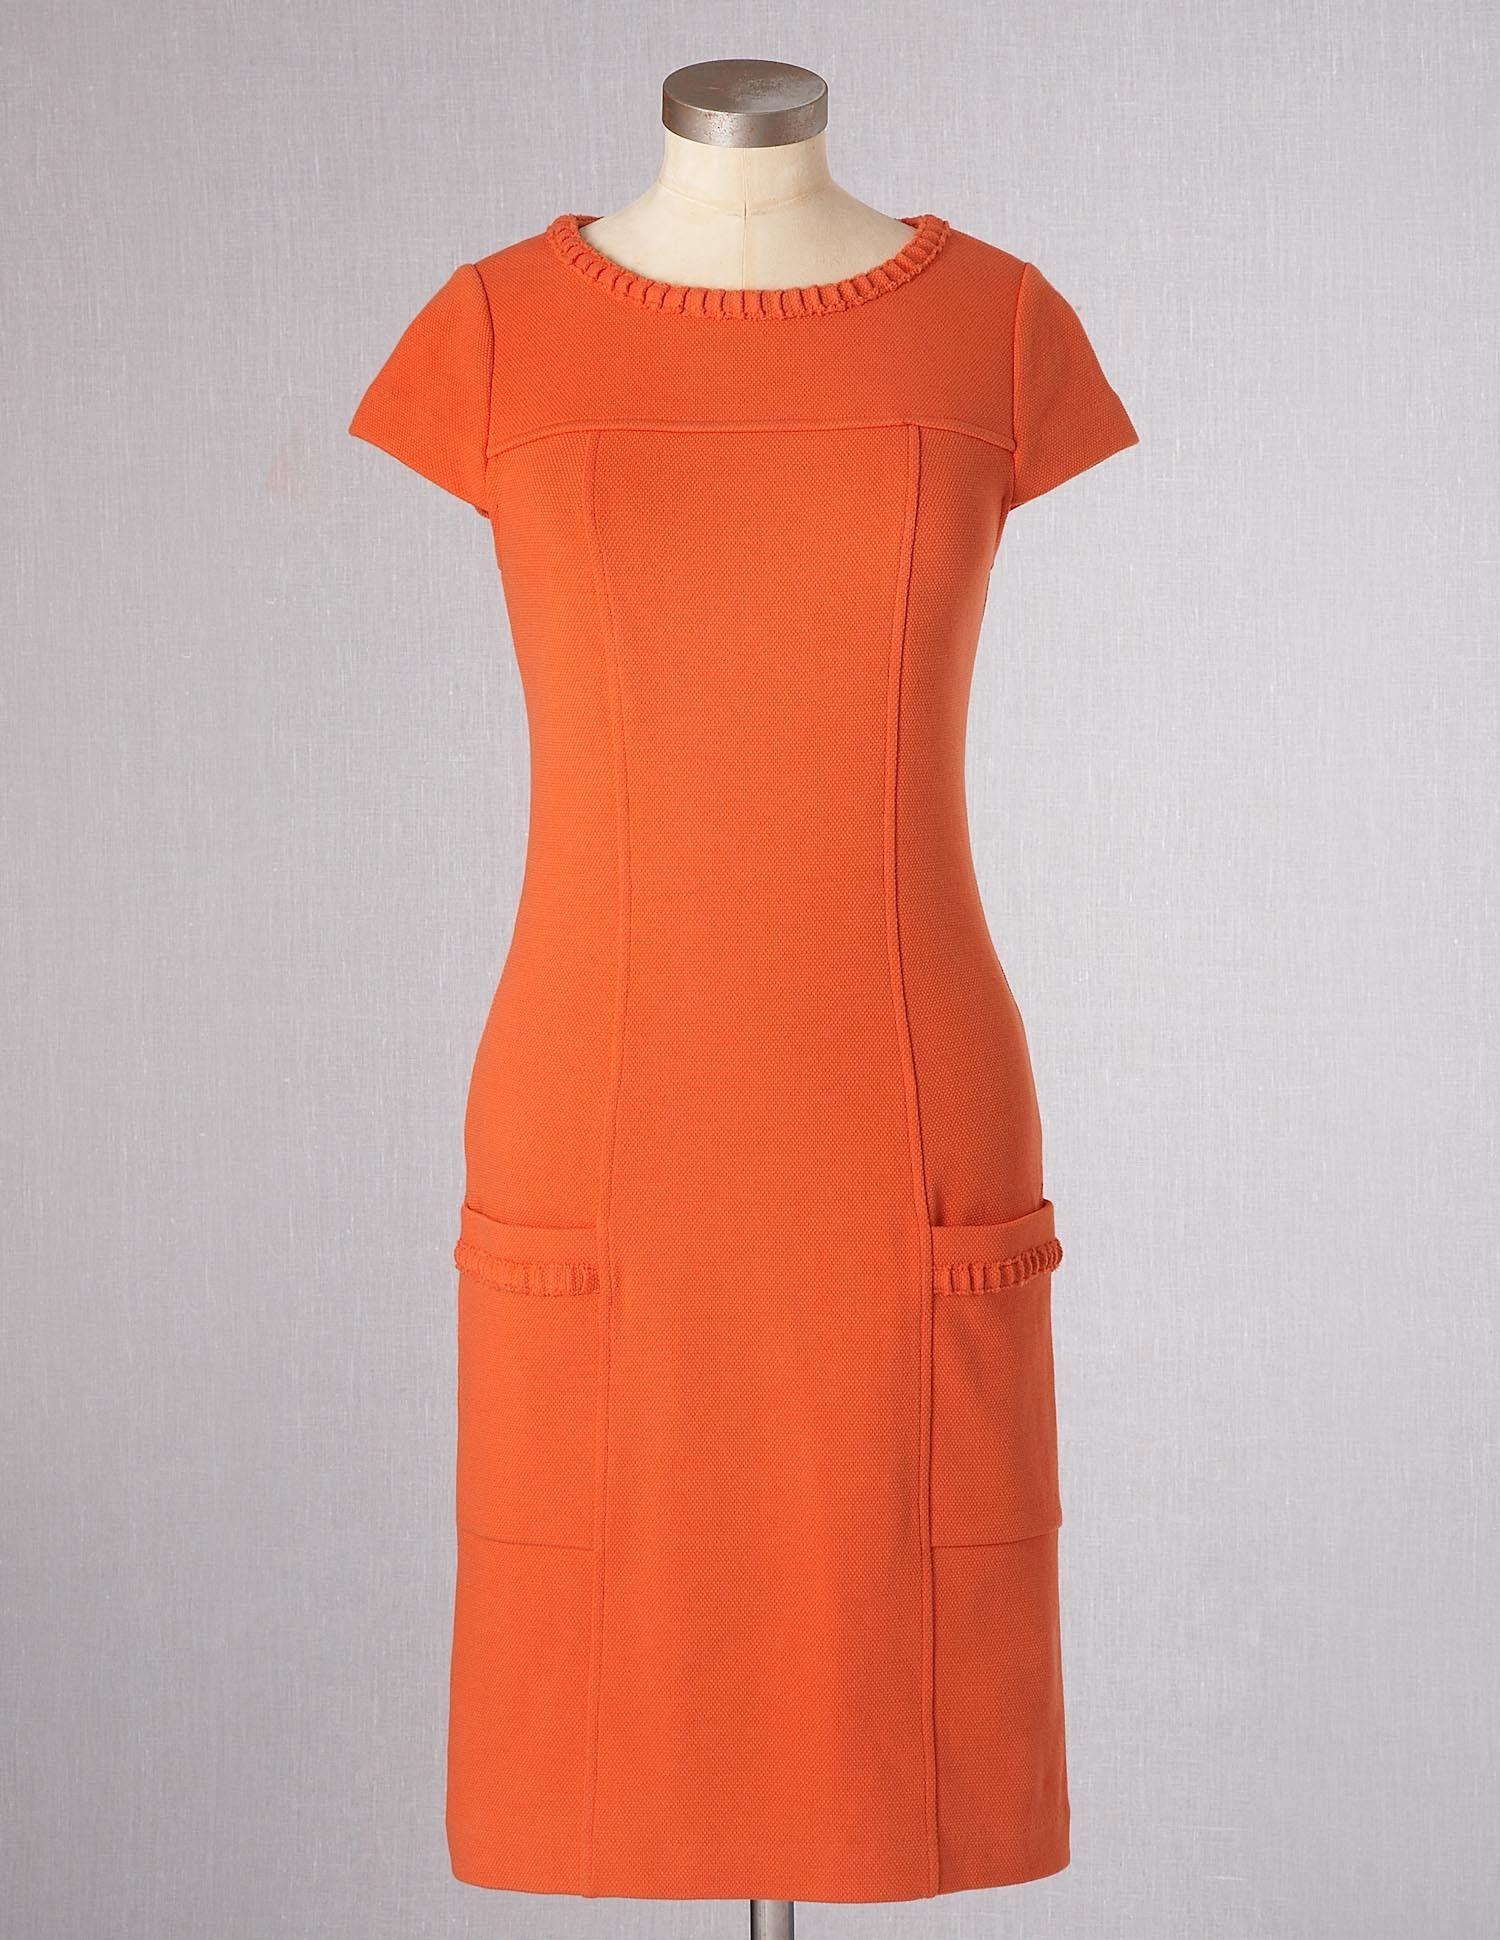 Summer Ponte Dress Boden Dresses Pinterest Boden Summer And